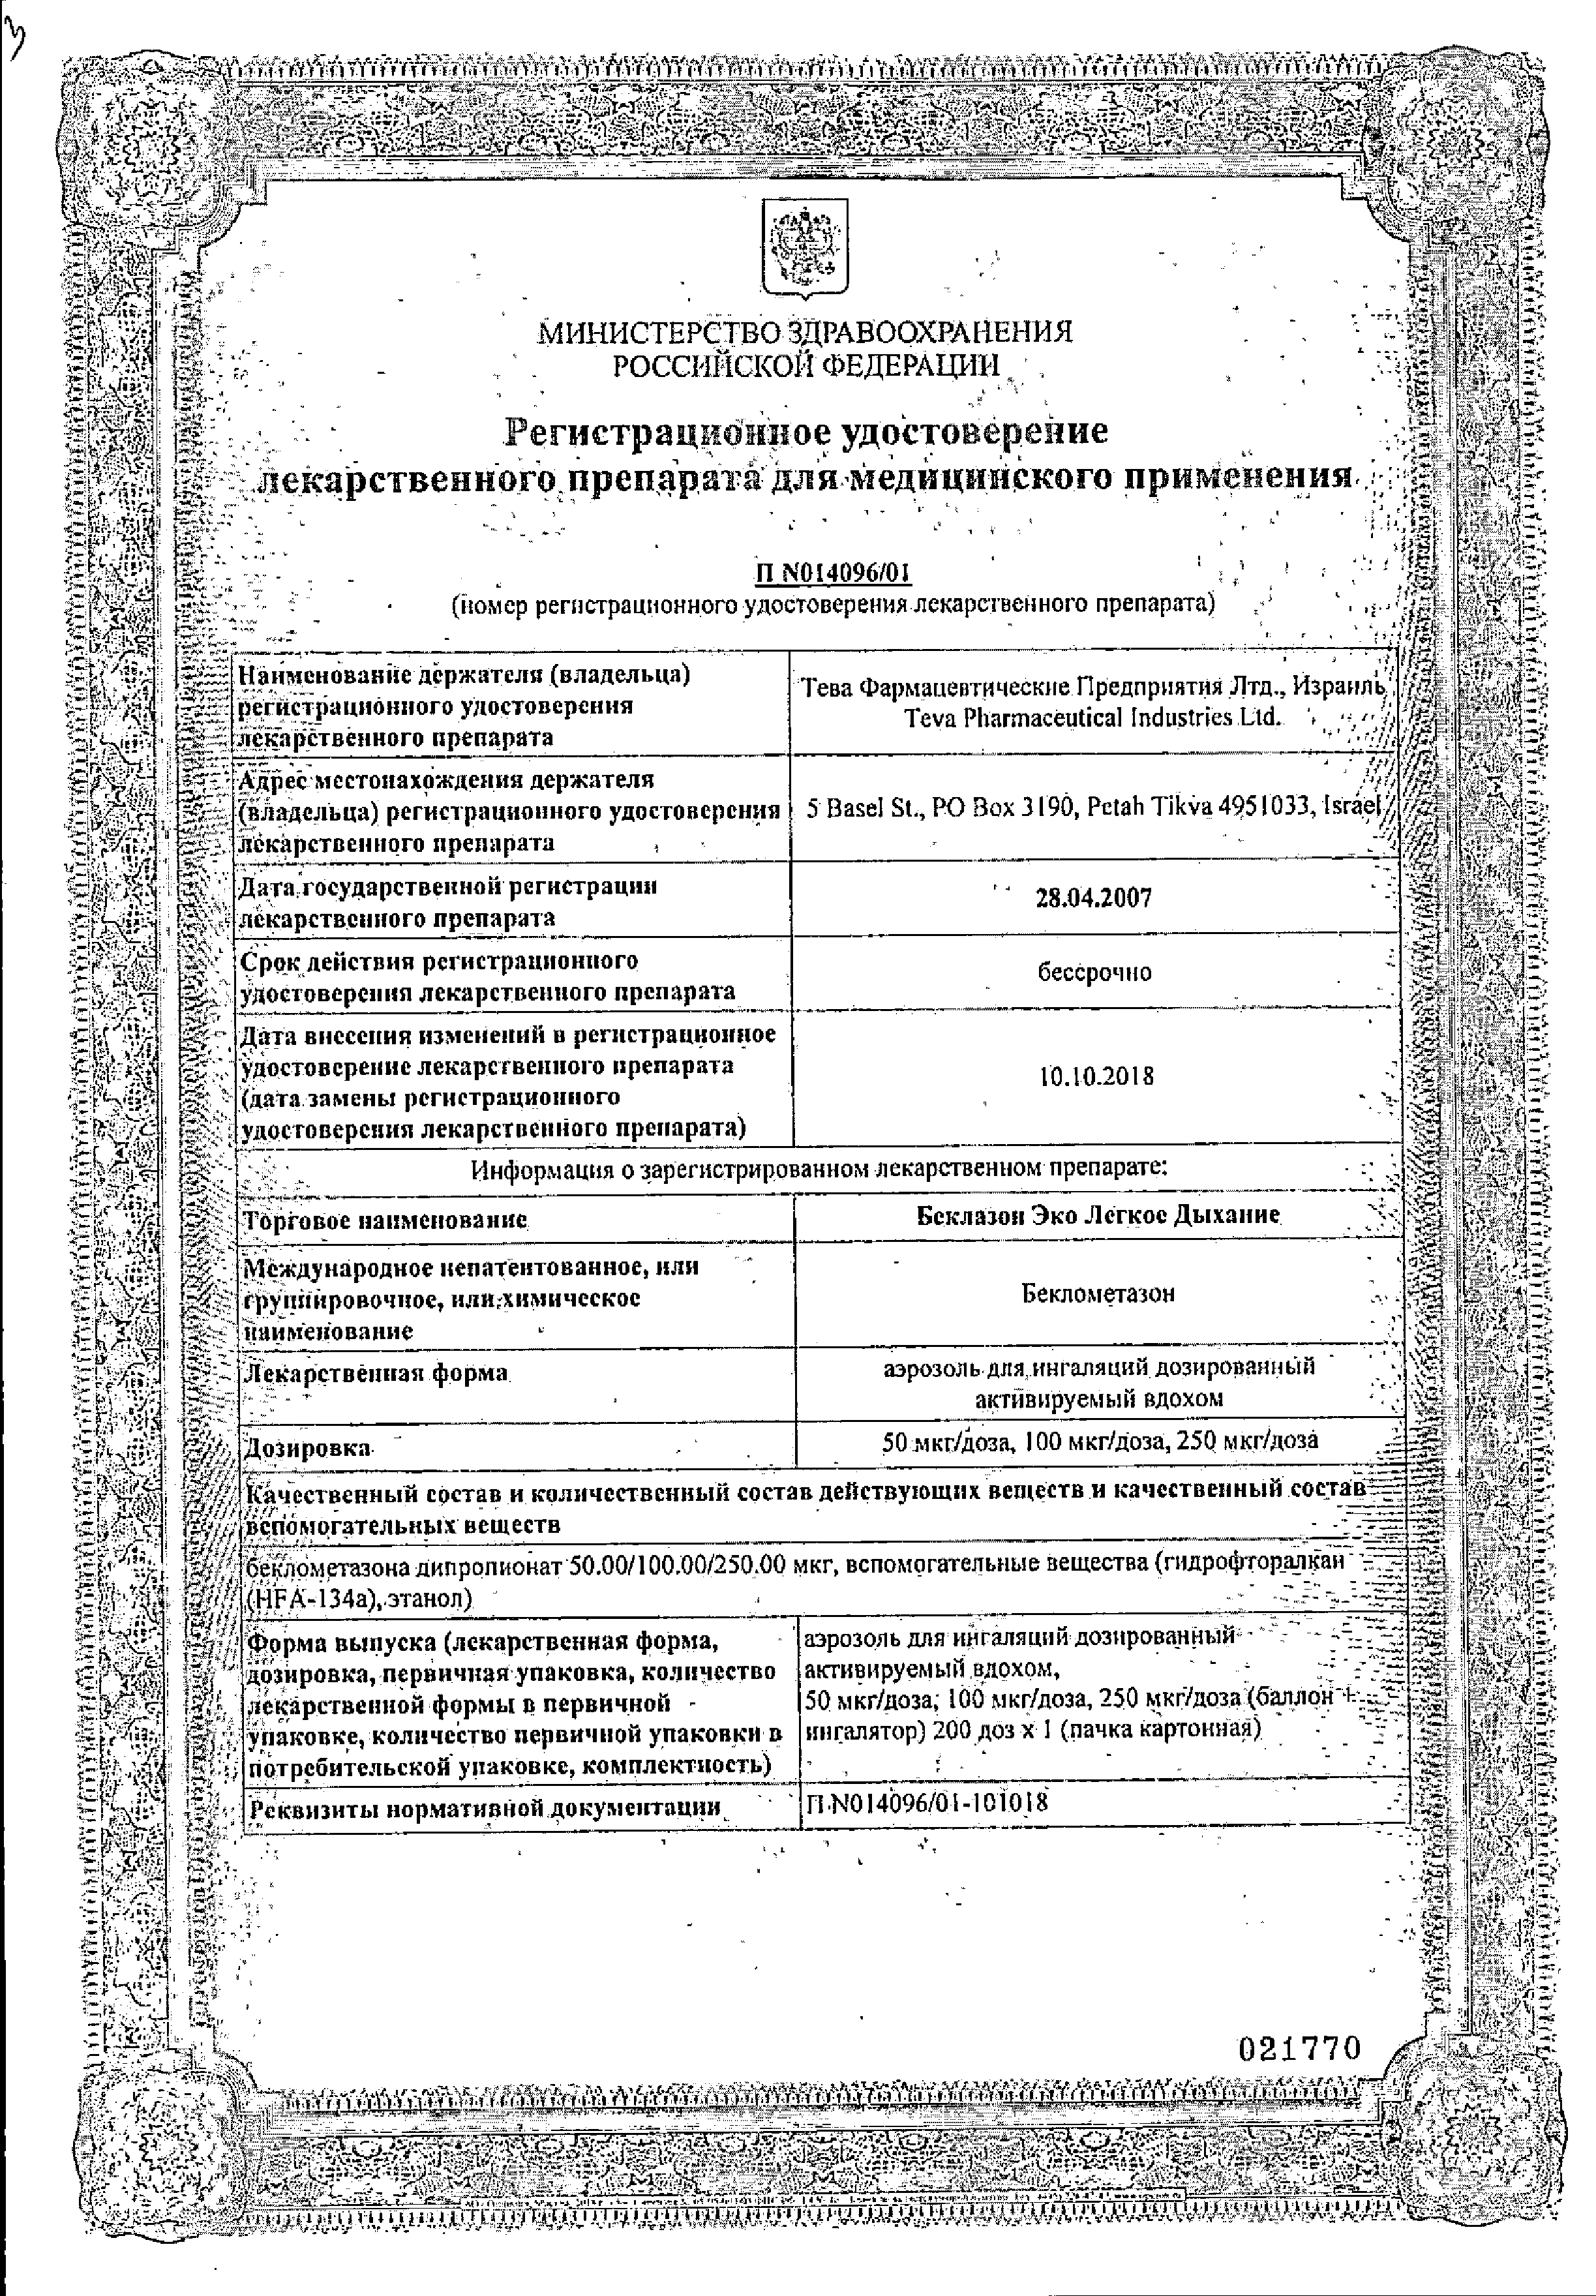 Беклазон Эко Легкое Дыхание сертификат